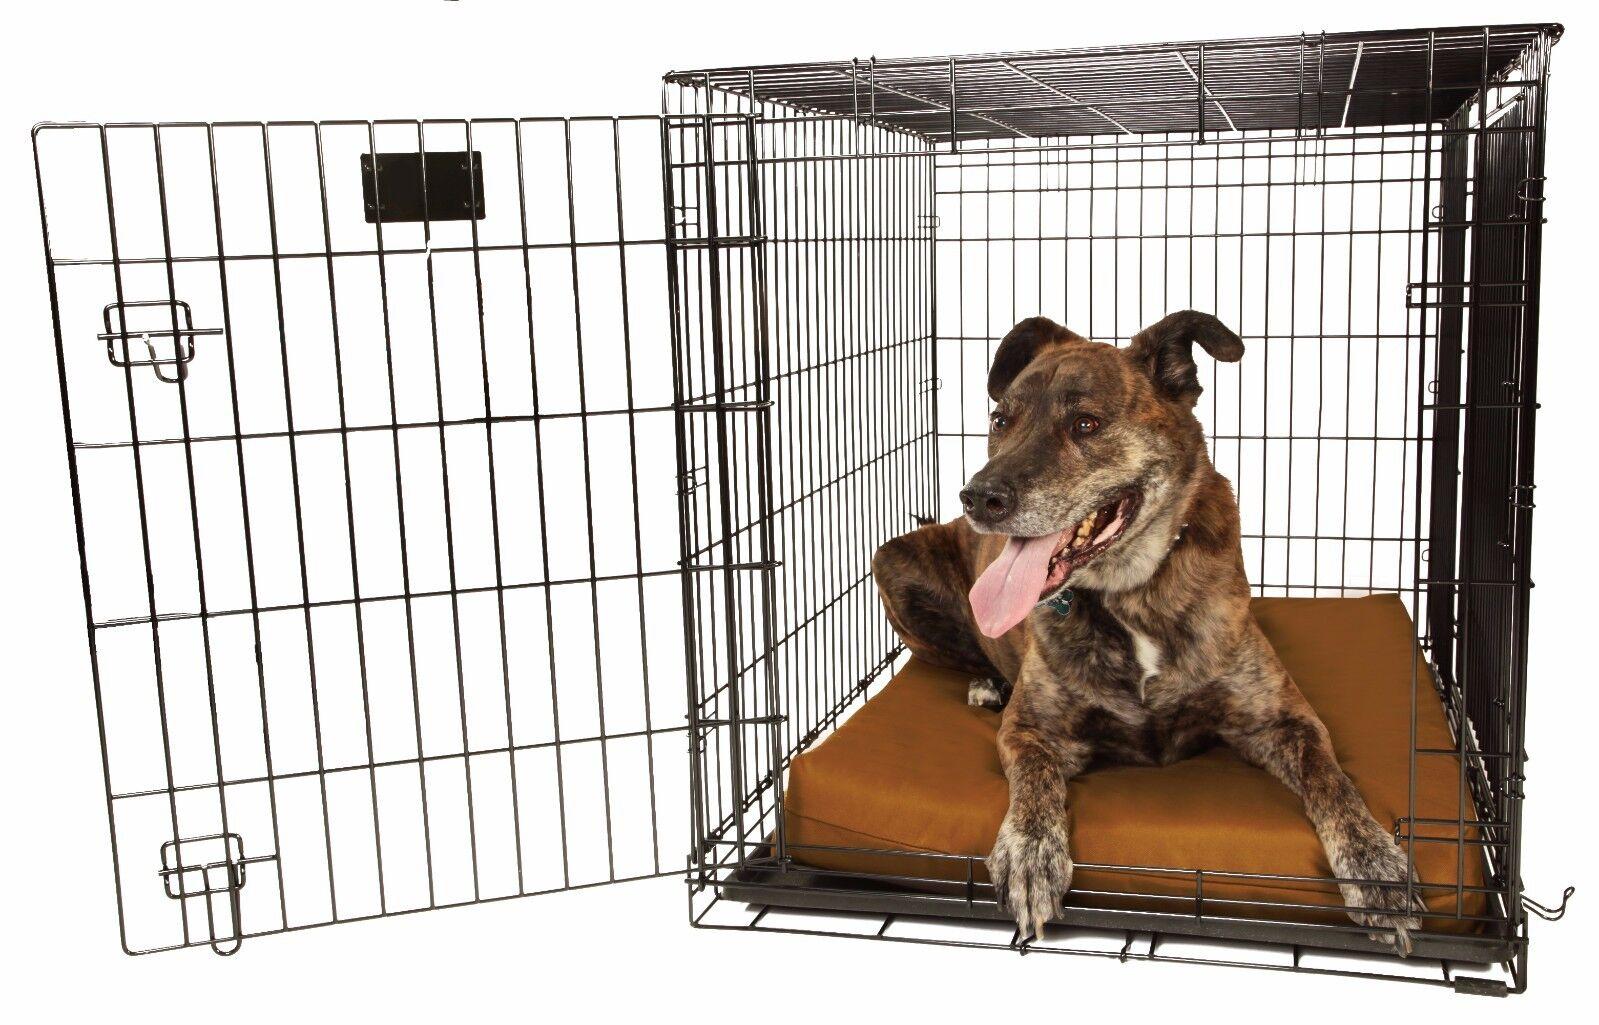 Big Barker 4 Orthopedic Dog Crate Pad. Waterproof. Mat fits standard dog crates